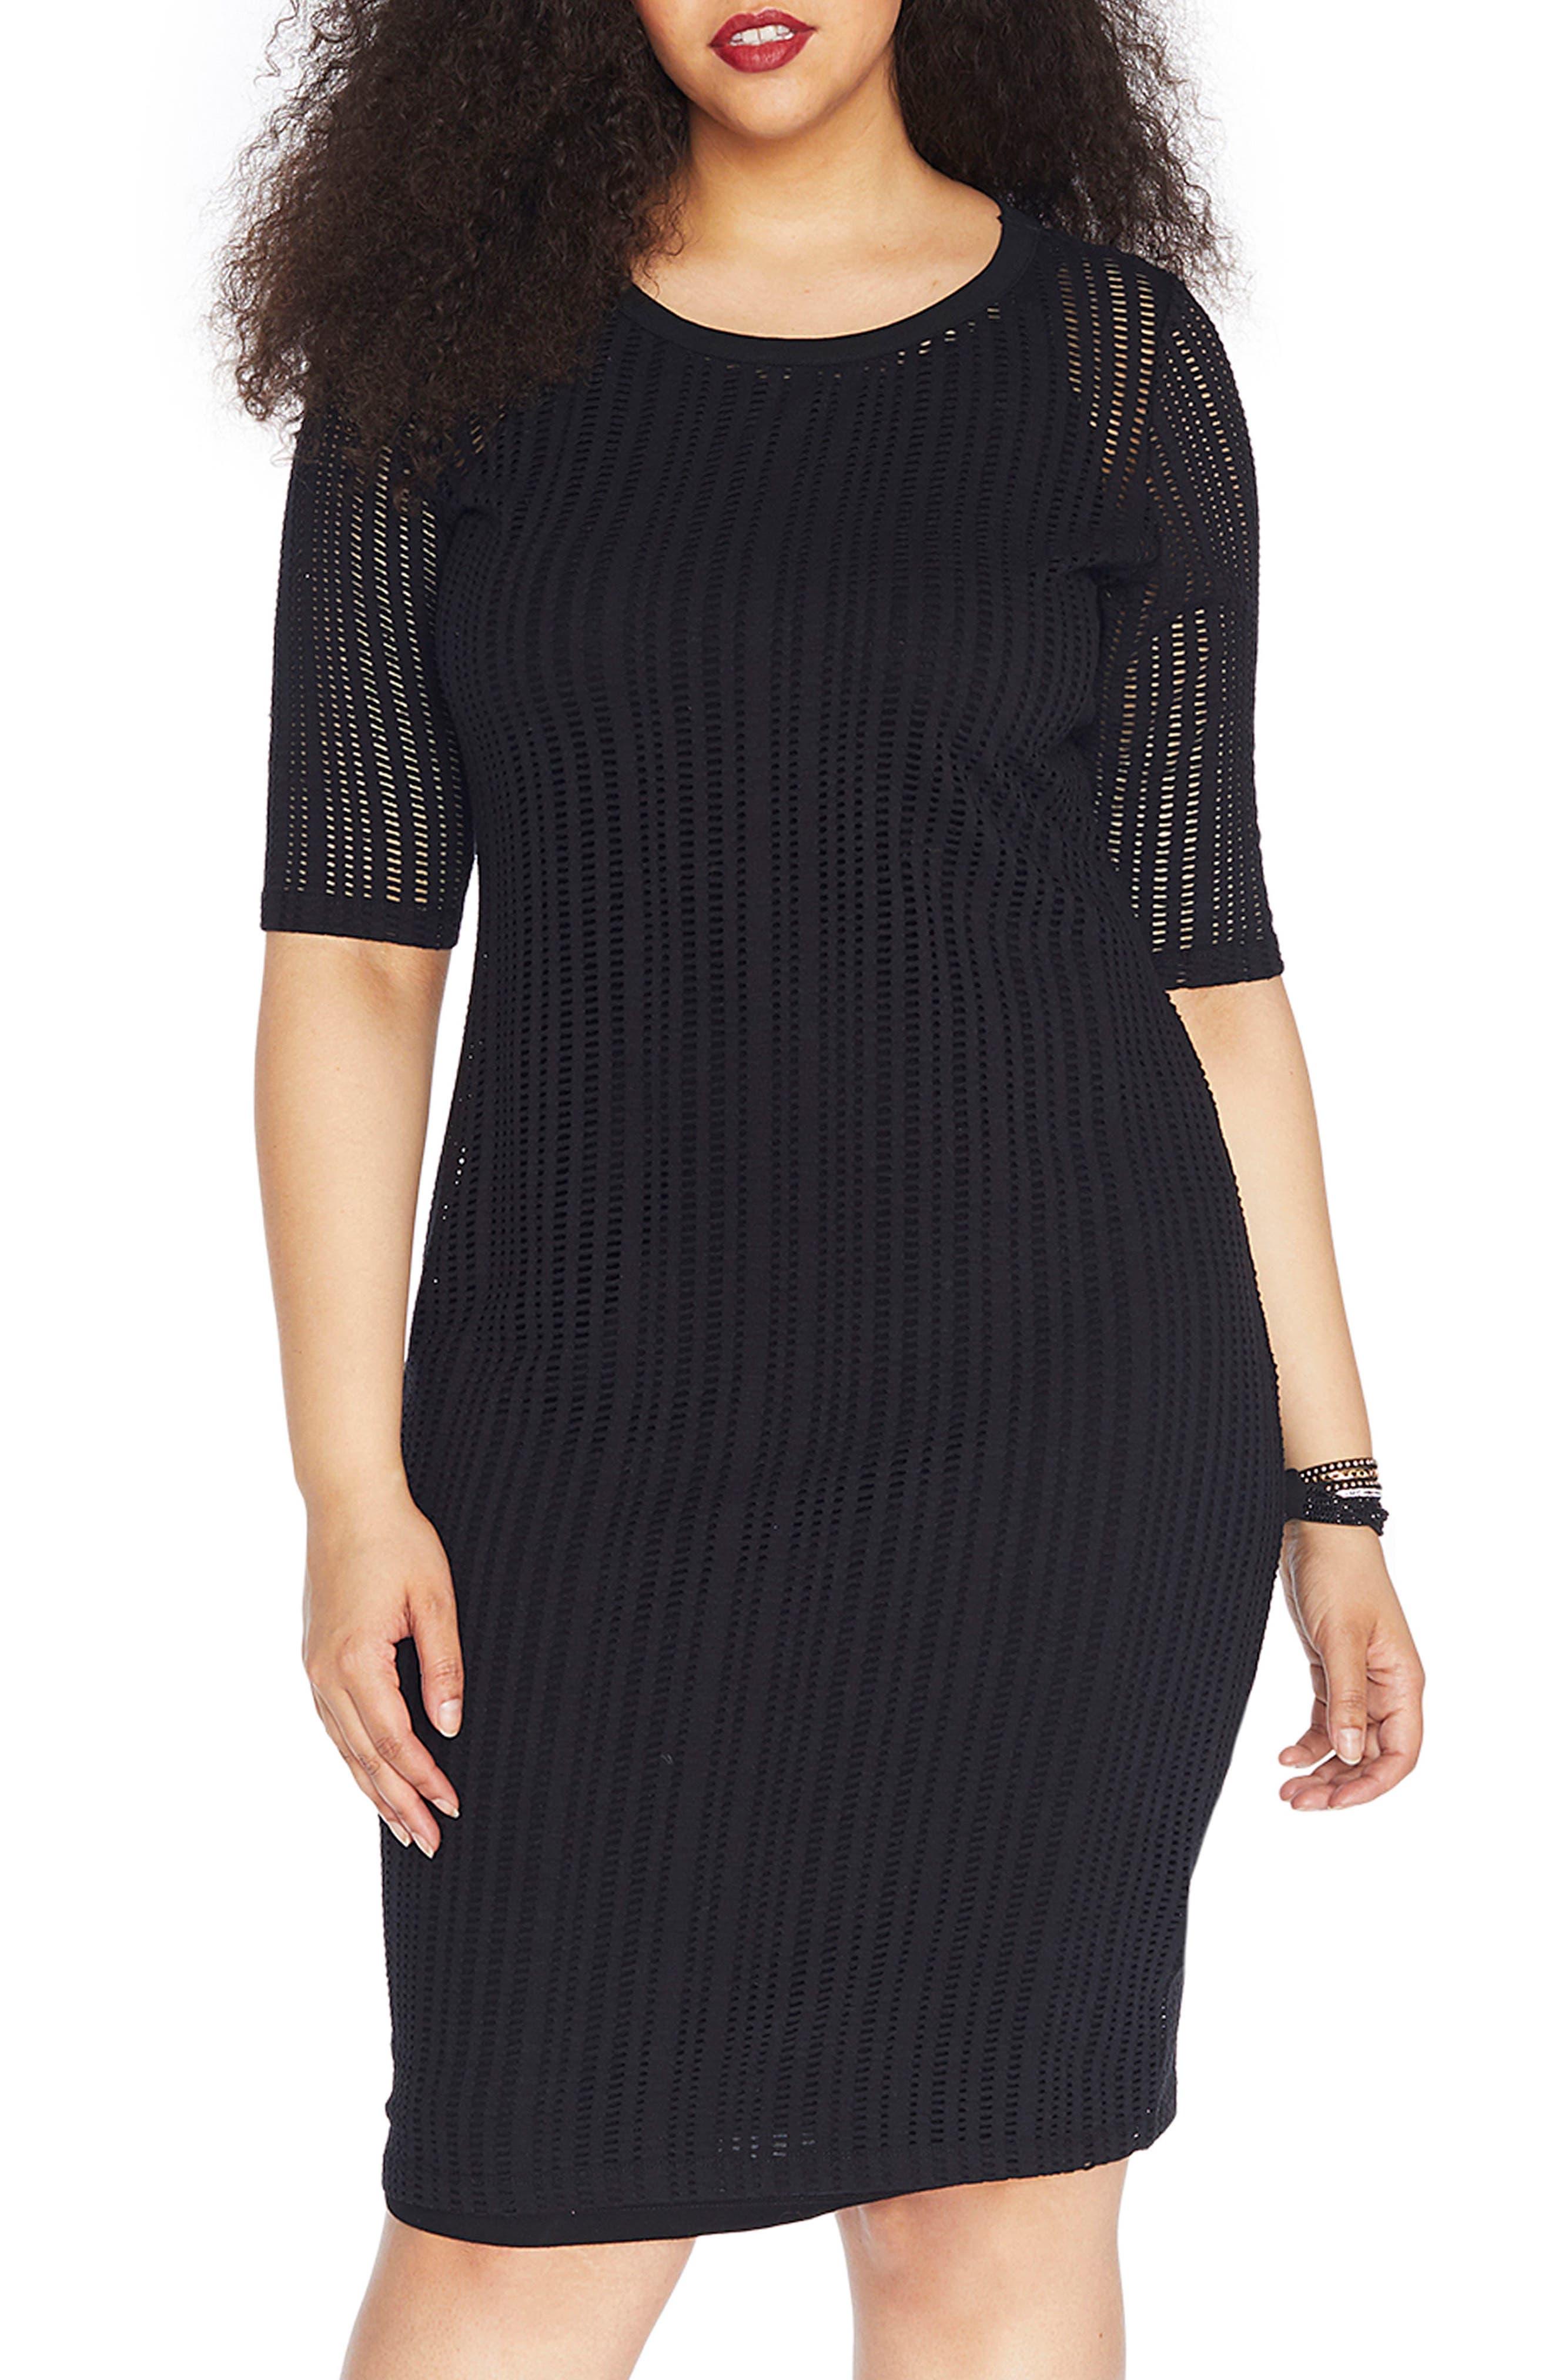 REBEL WILSON X ANGELS Stretch Jacquard Sheath Dress (Plus Size)